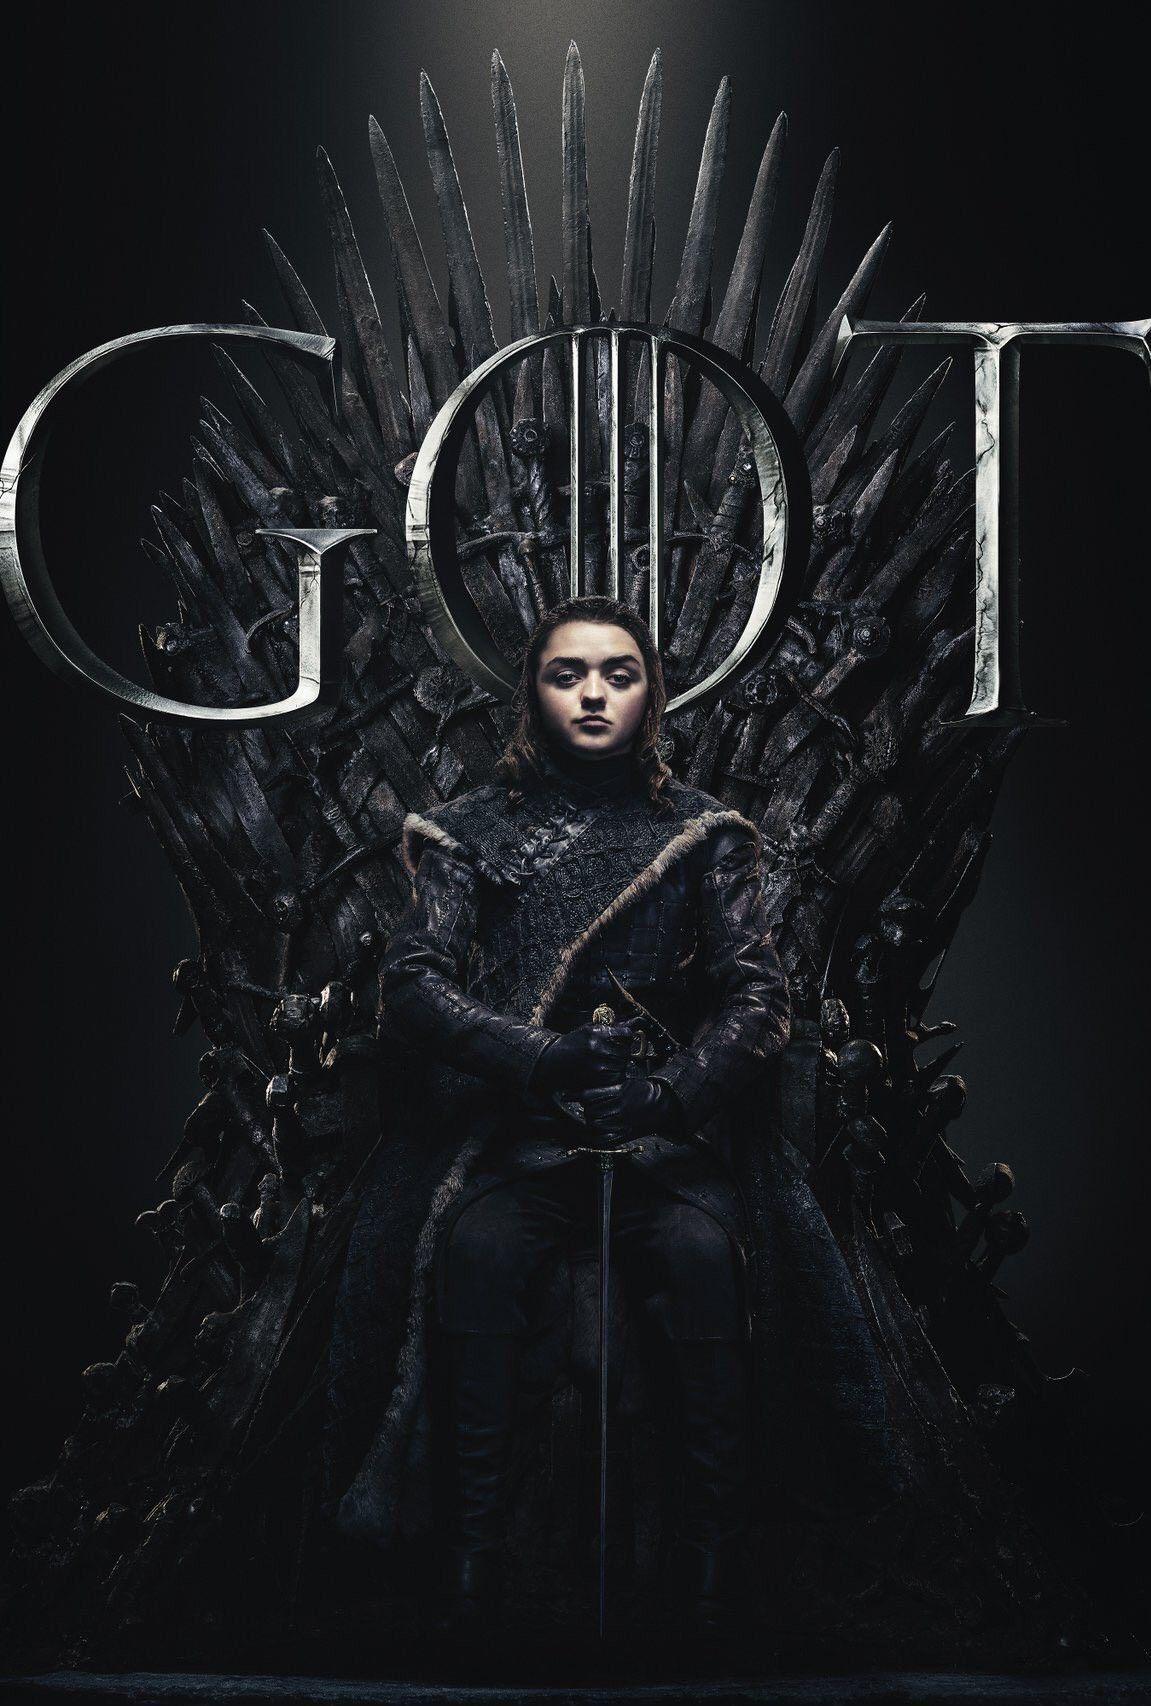 Arya Stark Night King Game Of Thrones Poster